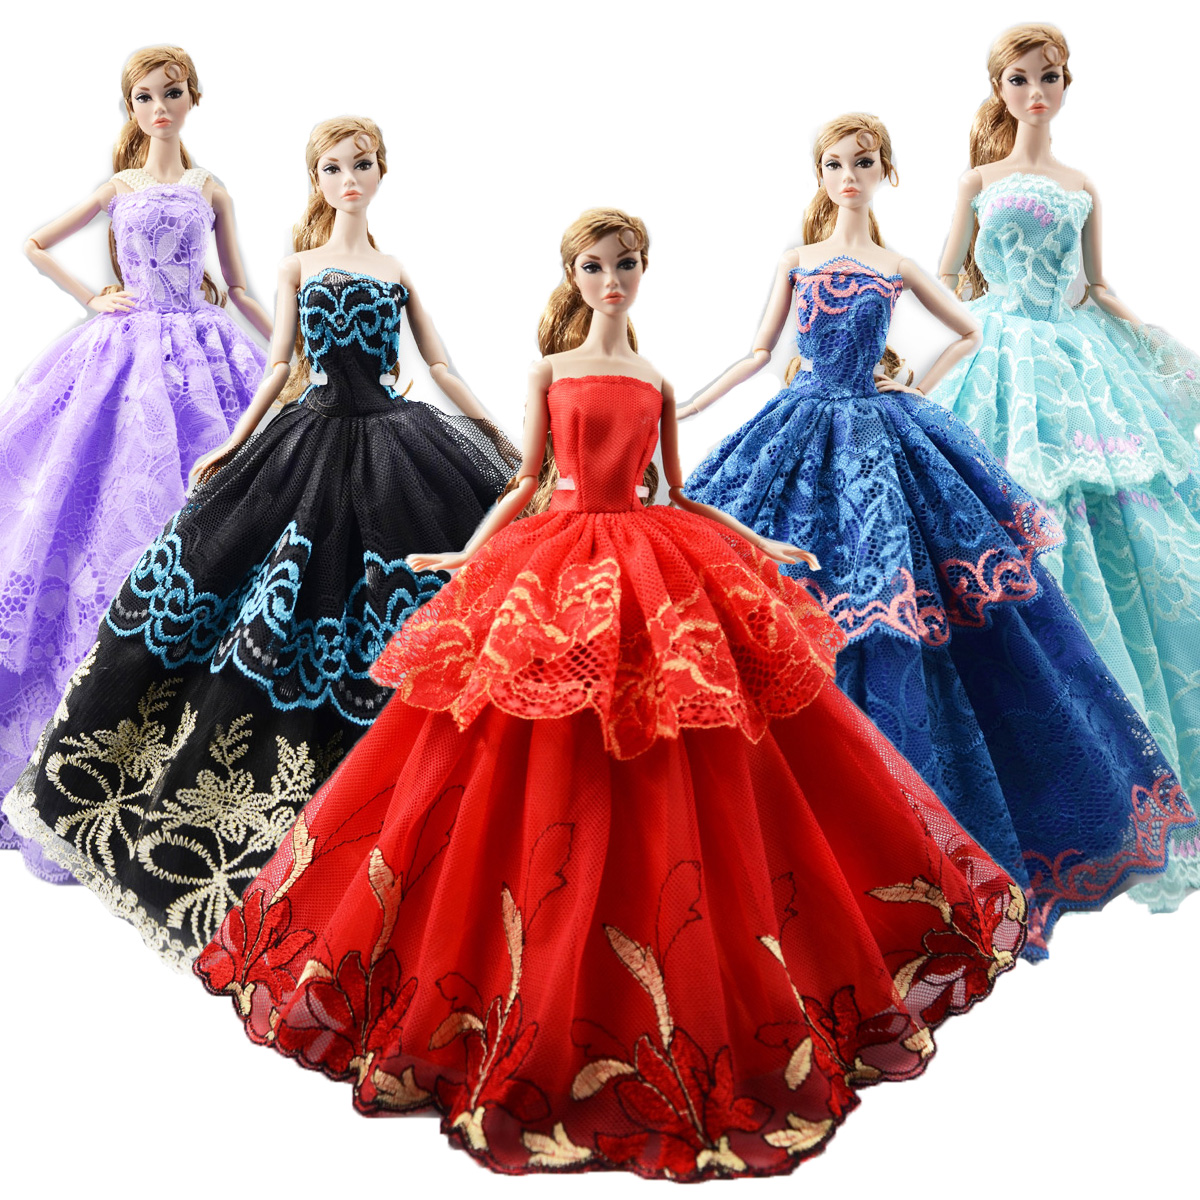 998b97621c723 Fashion 5x Dress Mixed Style Wedding Party Gown Princess Skirt ...